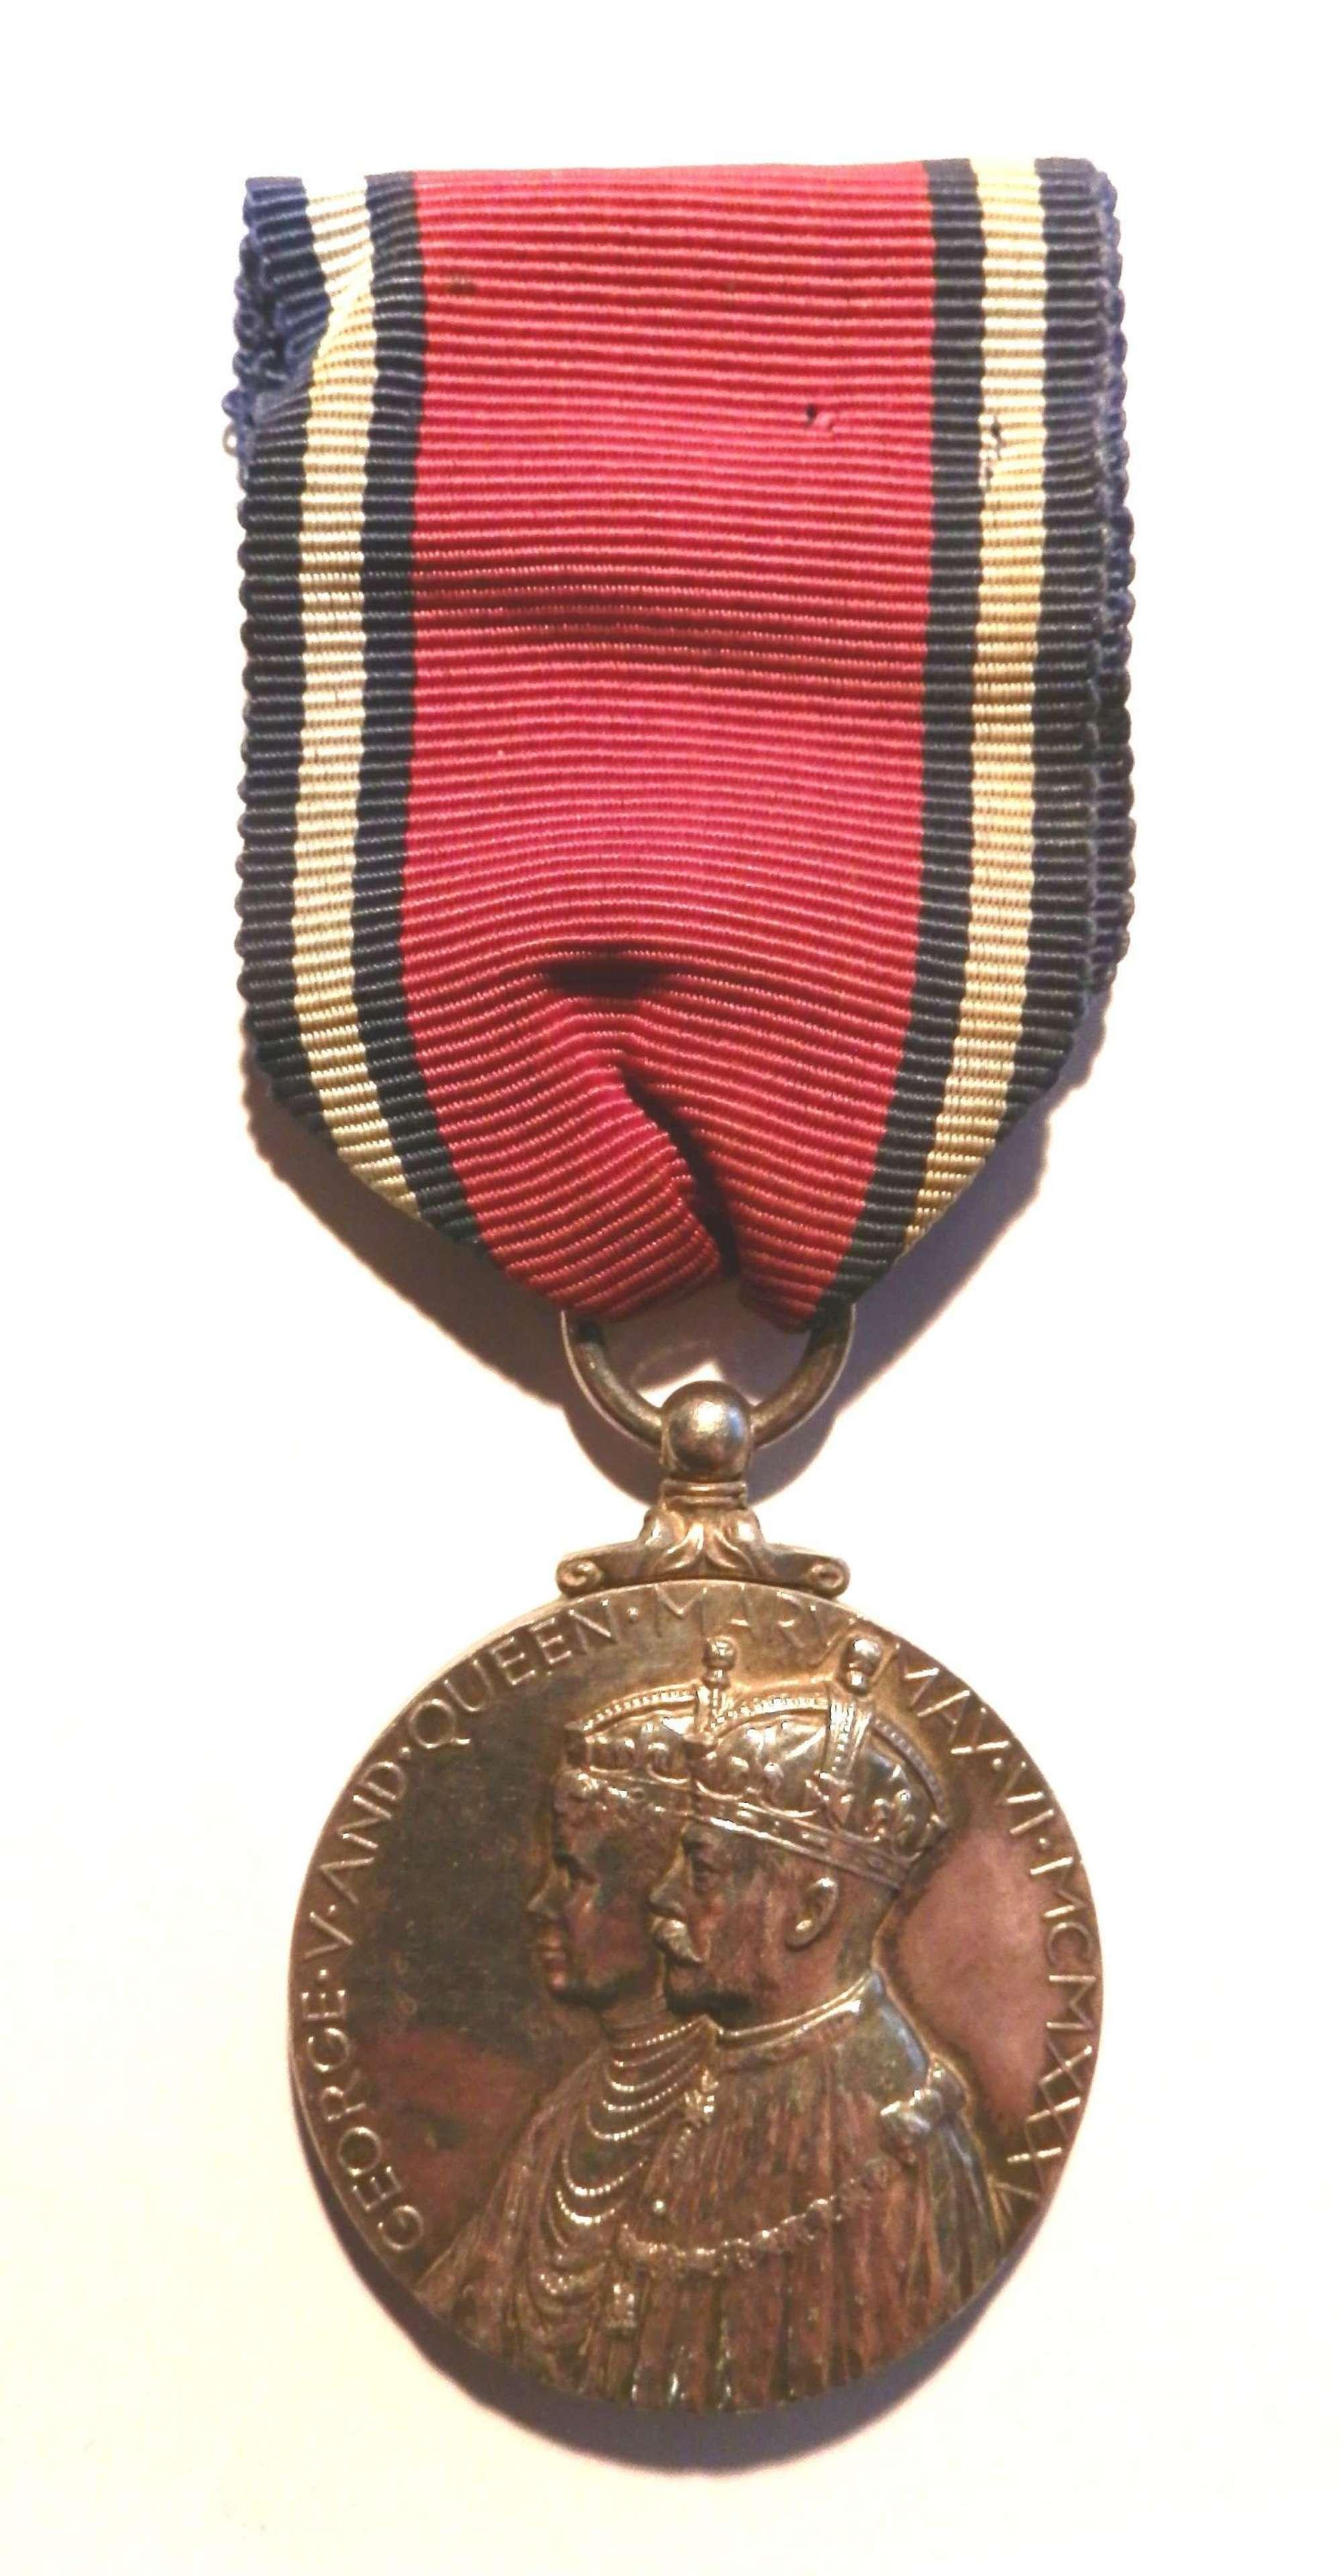 Jubilee Medal 1935. Inspector W.B. Whitworth.